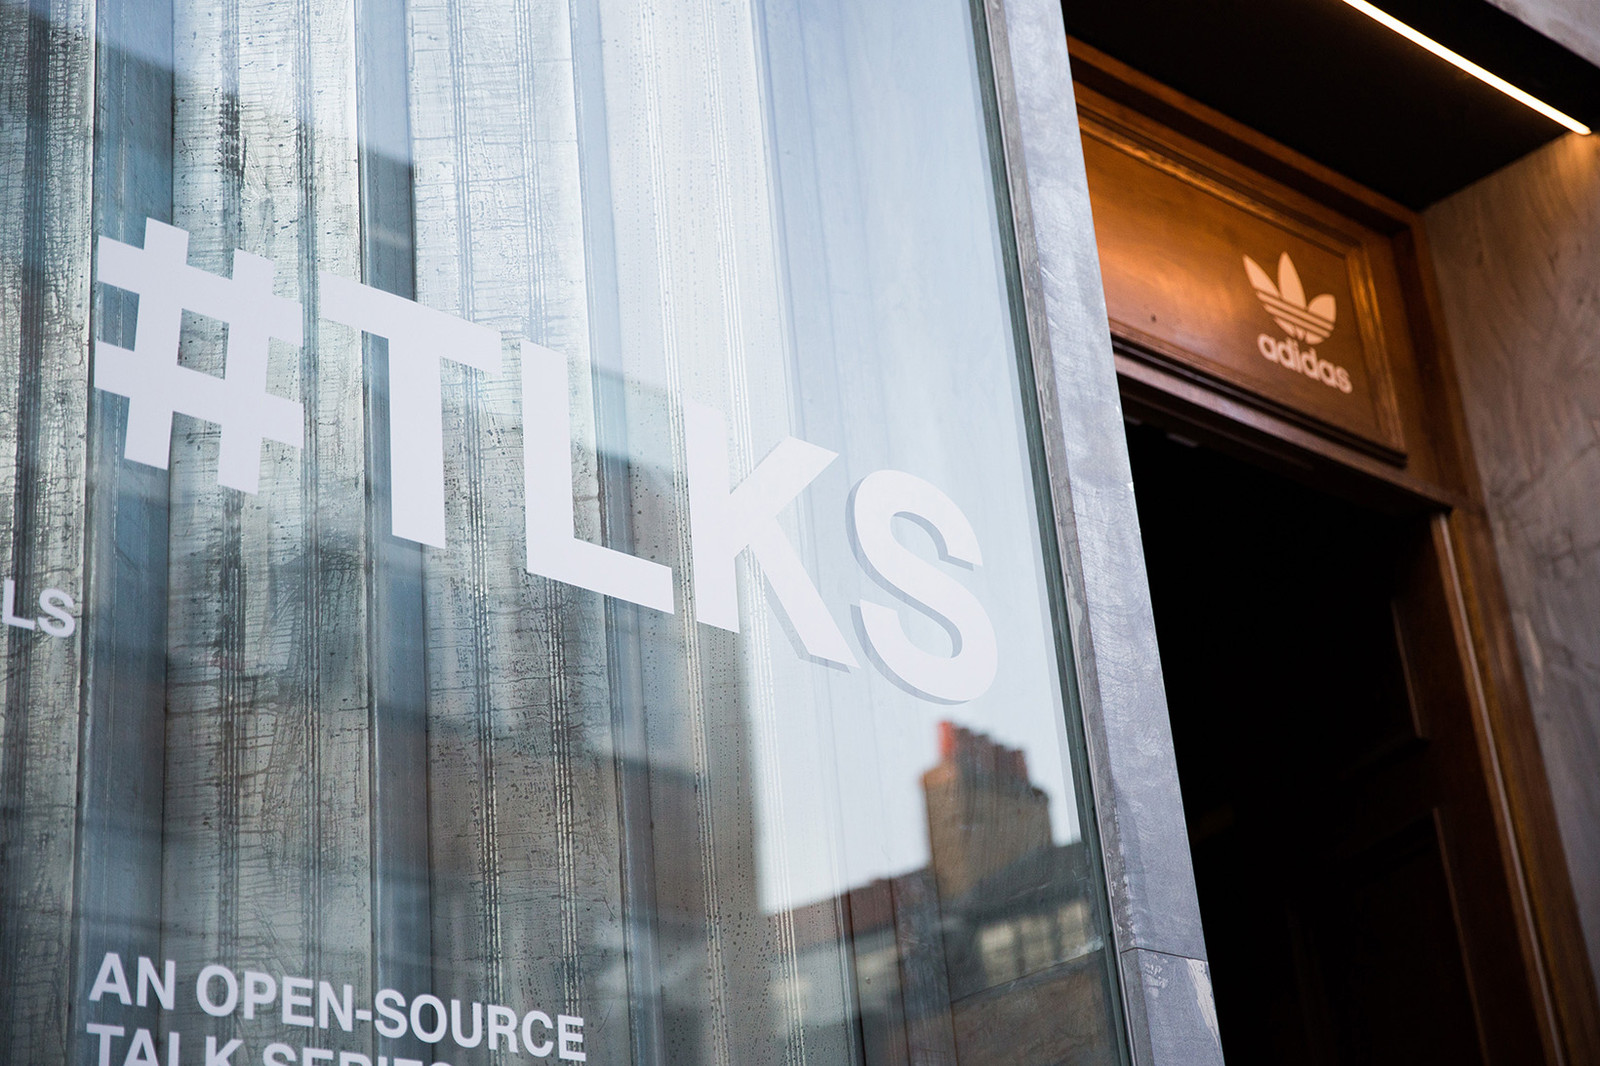 adidas Originals ARKYN #TLKS London Event Jamz Supernova Maya Jama Hanbury Street Recap